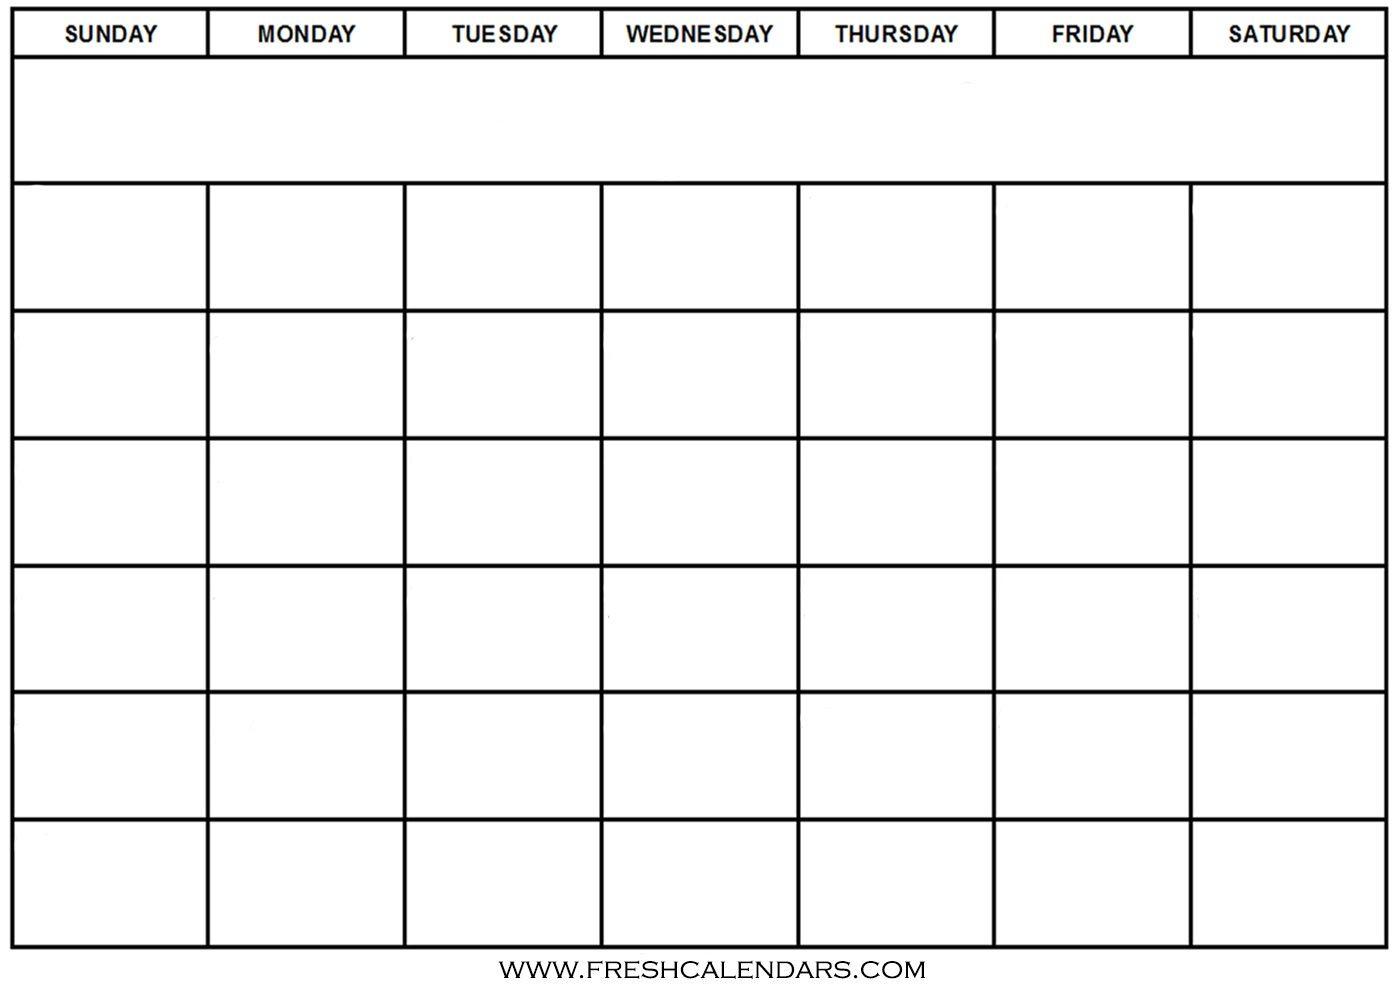 Calendar Template Free Printable Blank Calendar Wonderfully throughout Free Printable Blank Calendar Templates